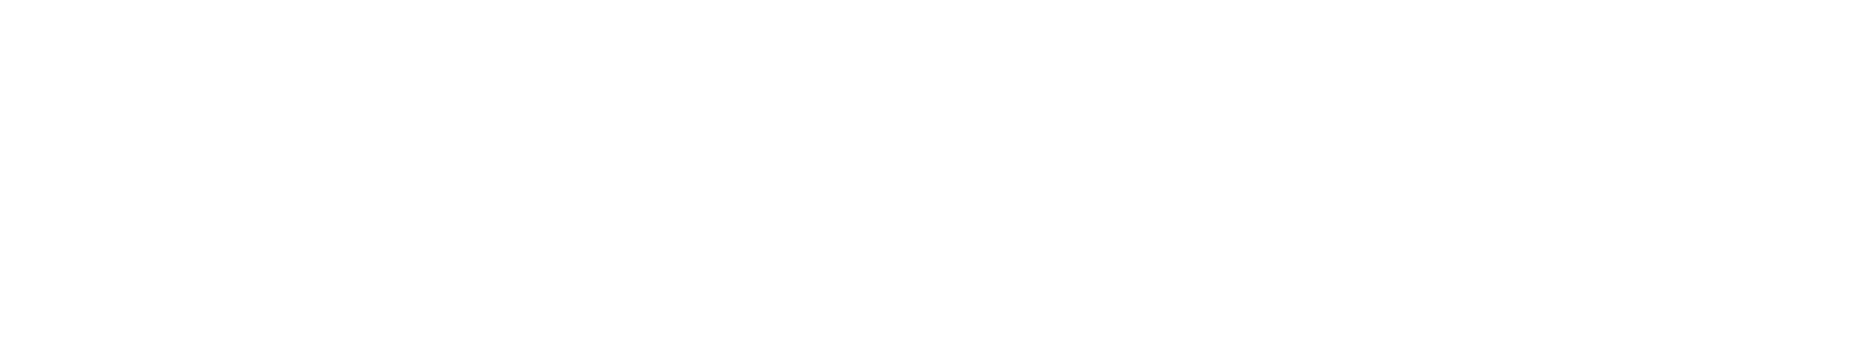 Waynflete